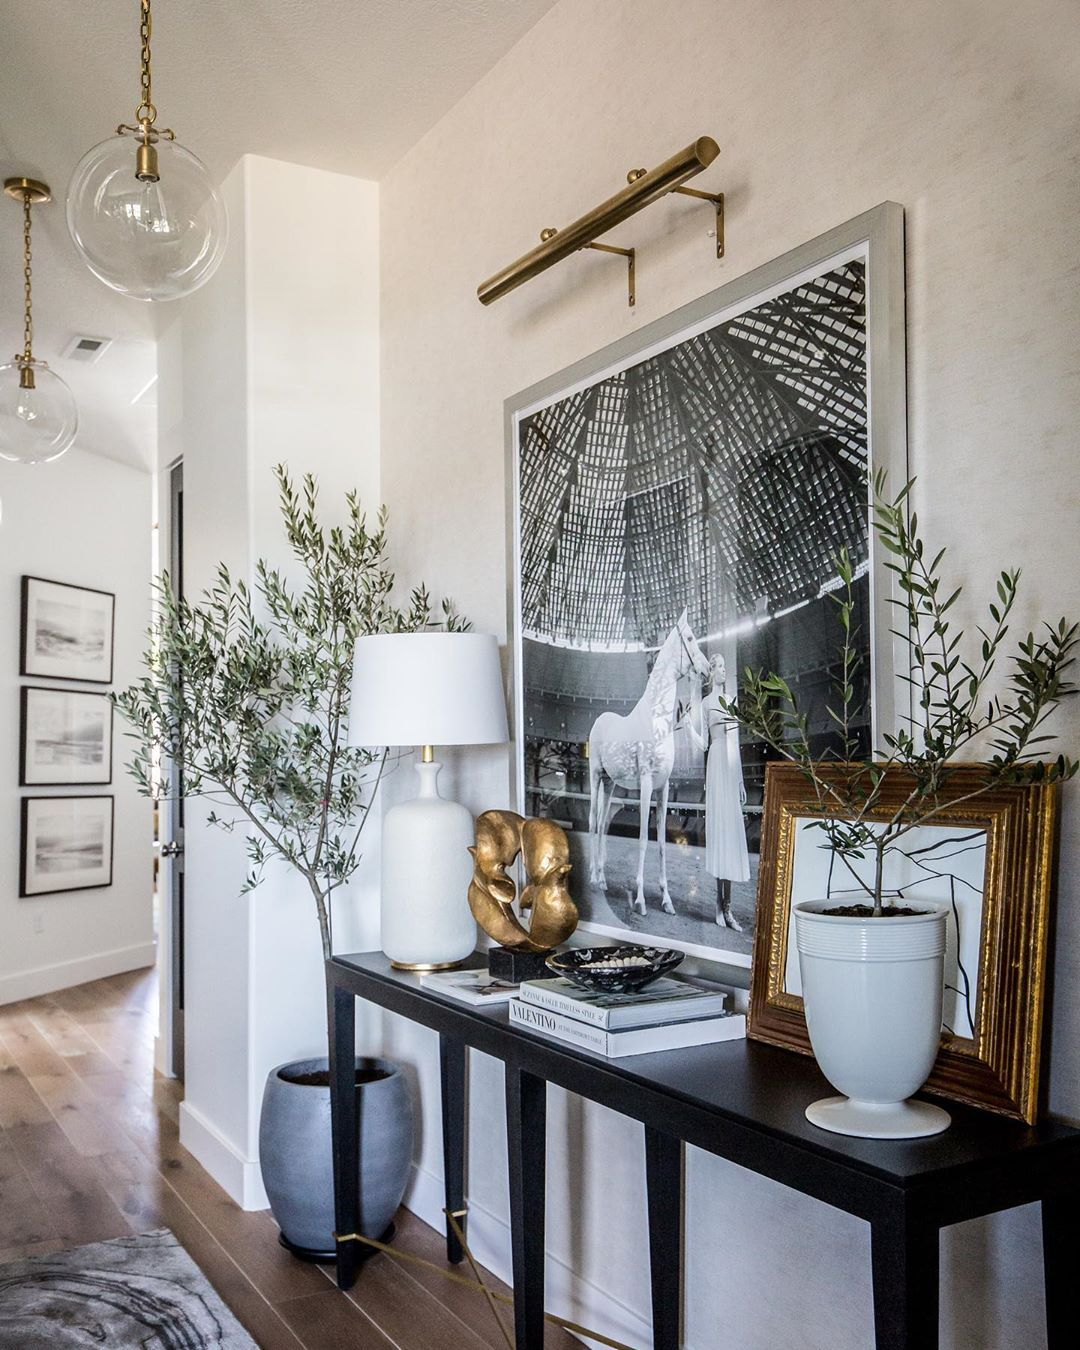 27+ Round carpet in living room ideas in 2021